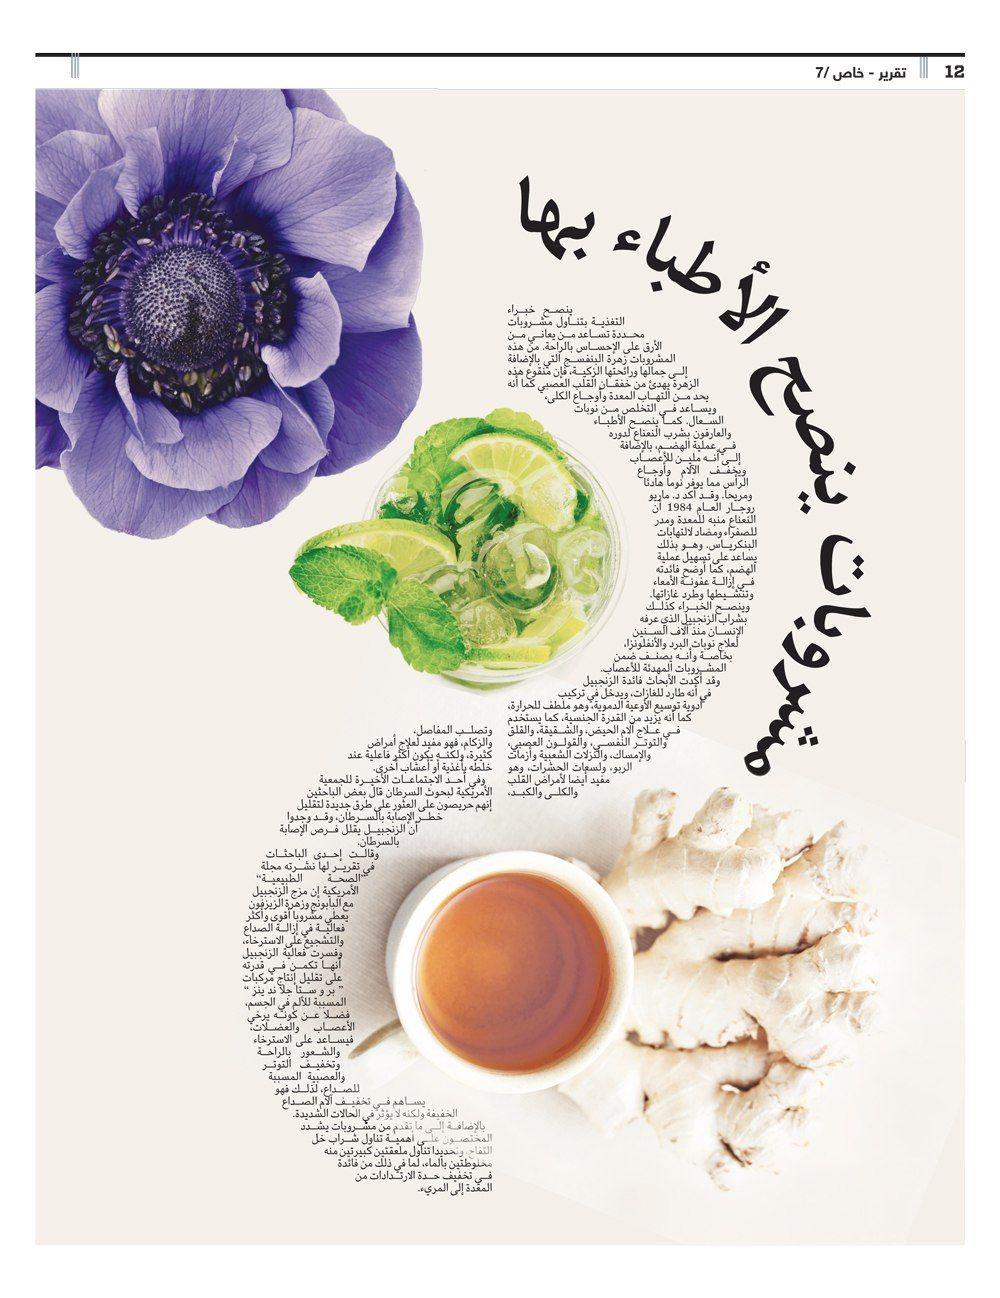 Ulz R9ynk Jpg 1000 1298 Magazine Design Newspaper Design Food Magazine